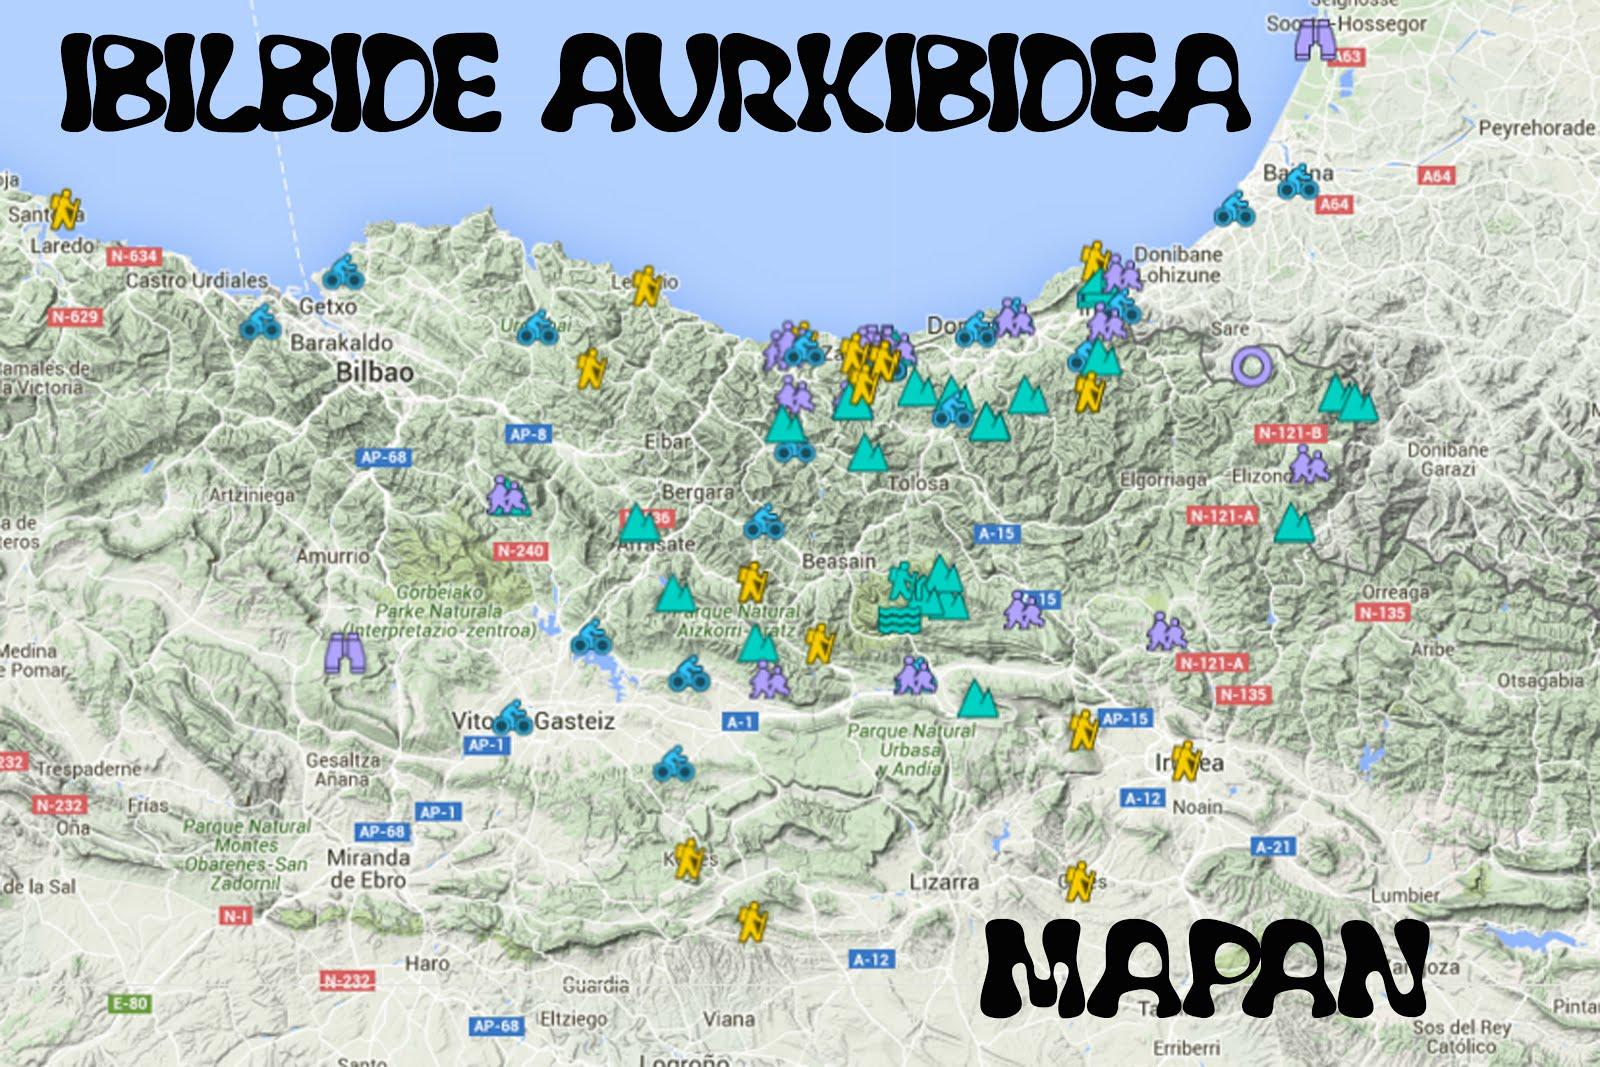 IBILBIDE AURKIBIDEA MAPAN